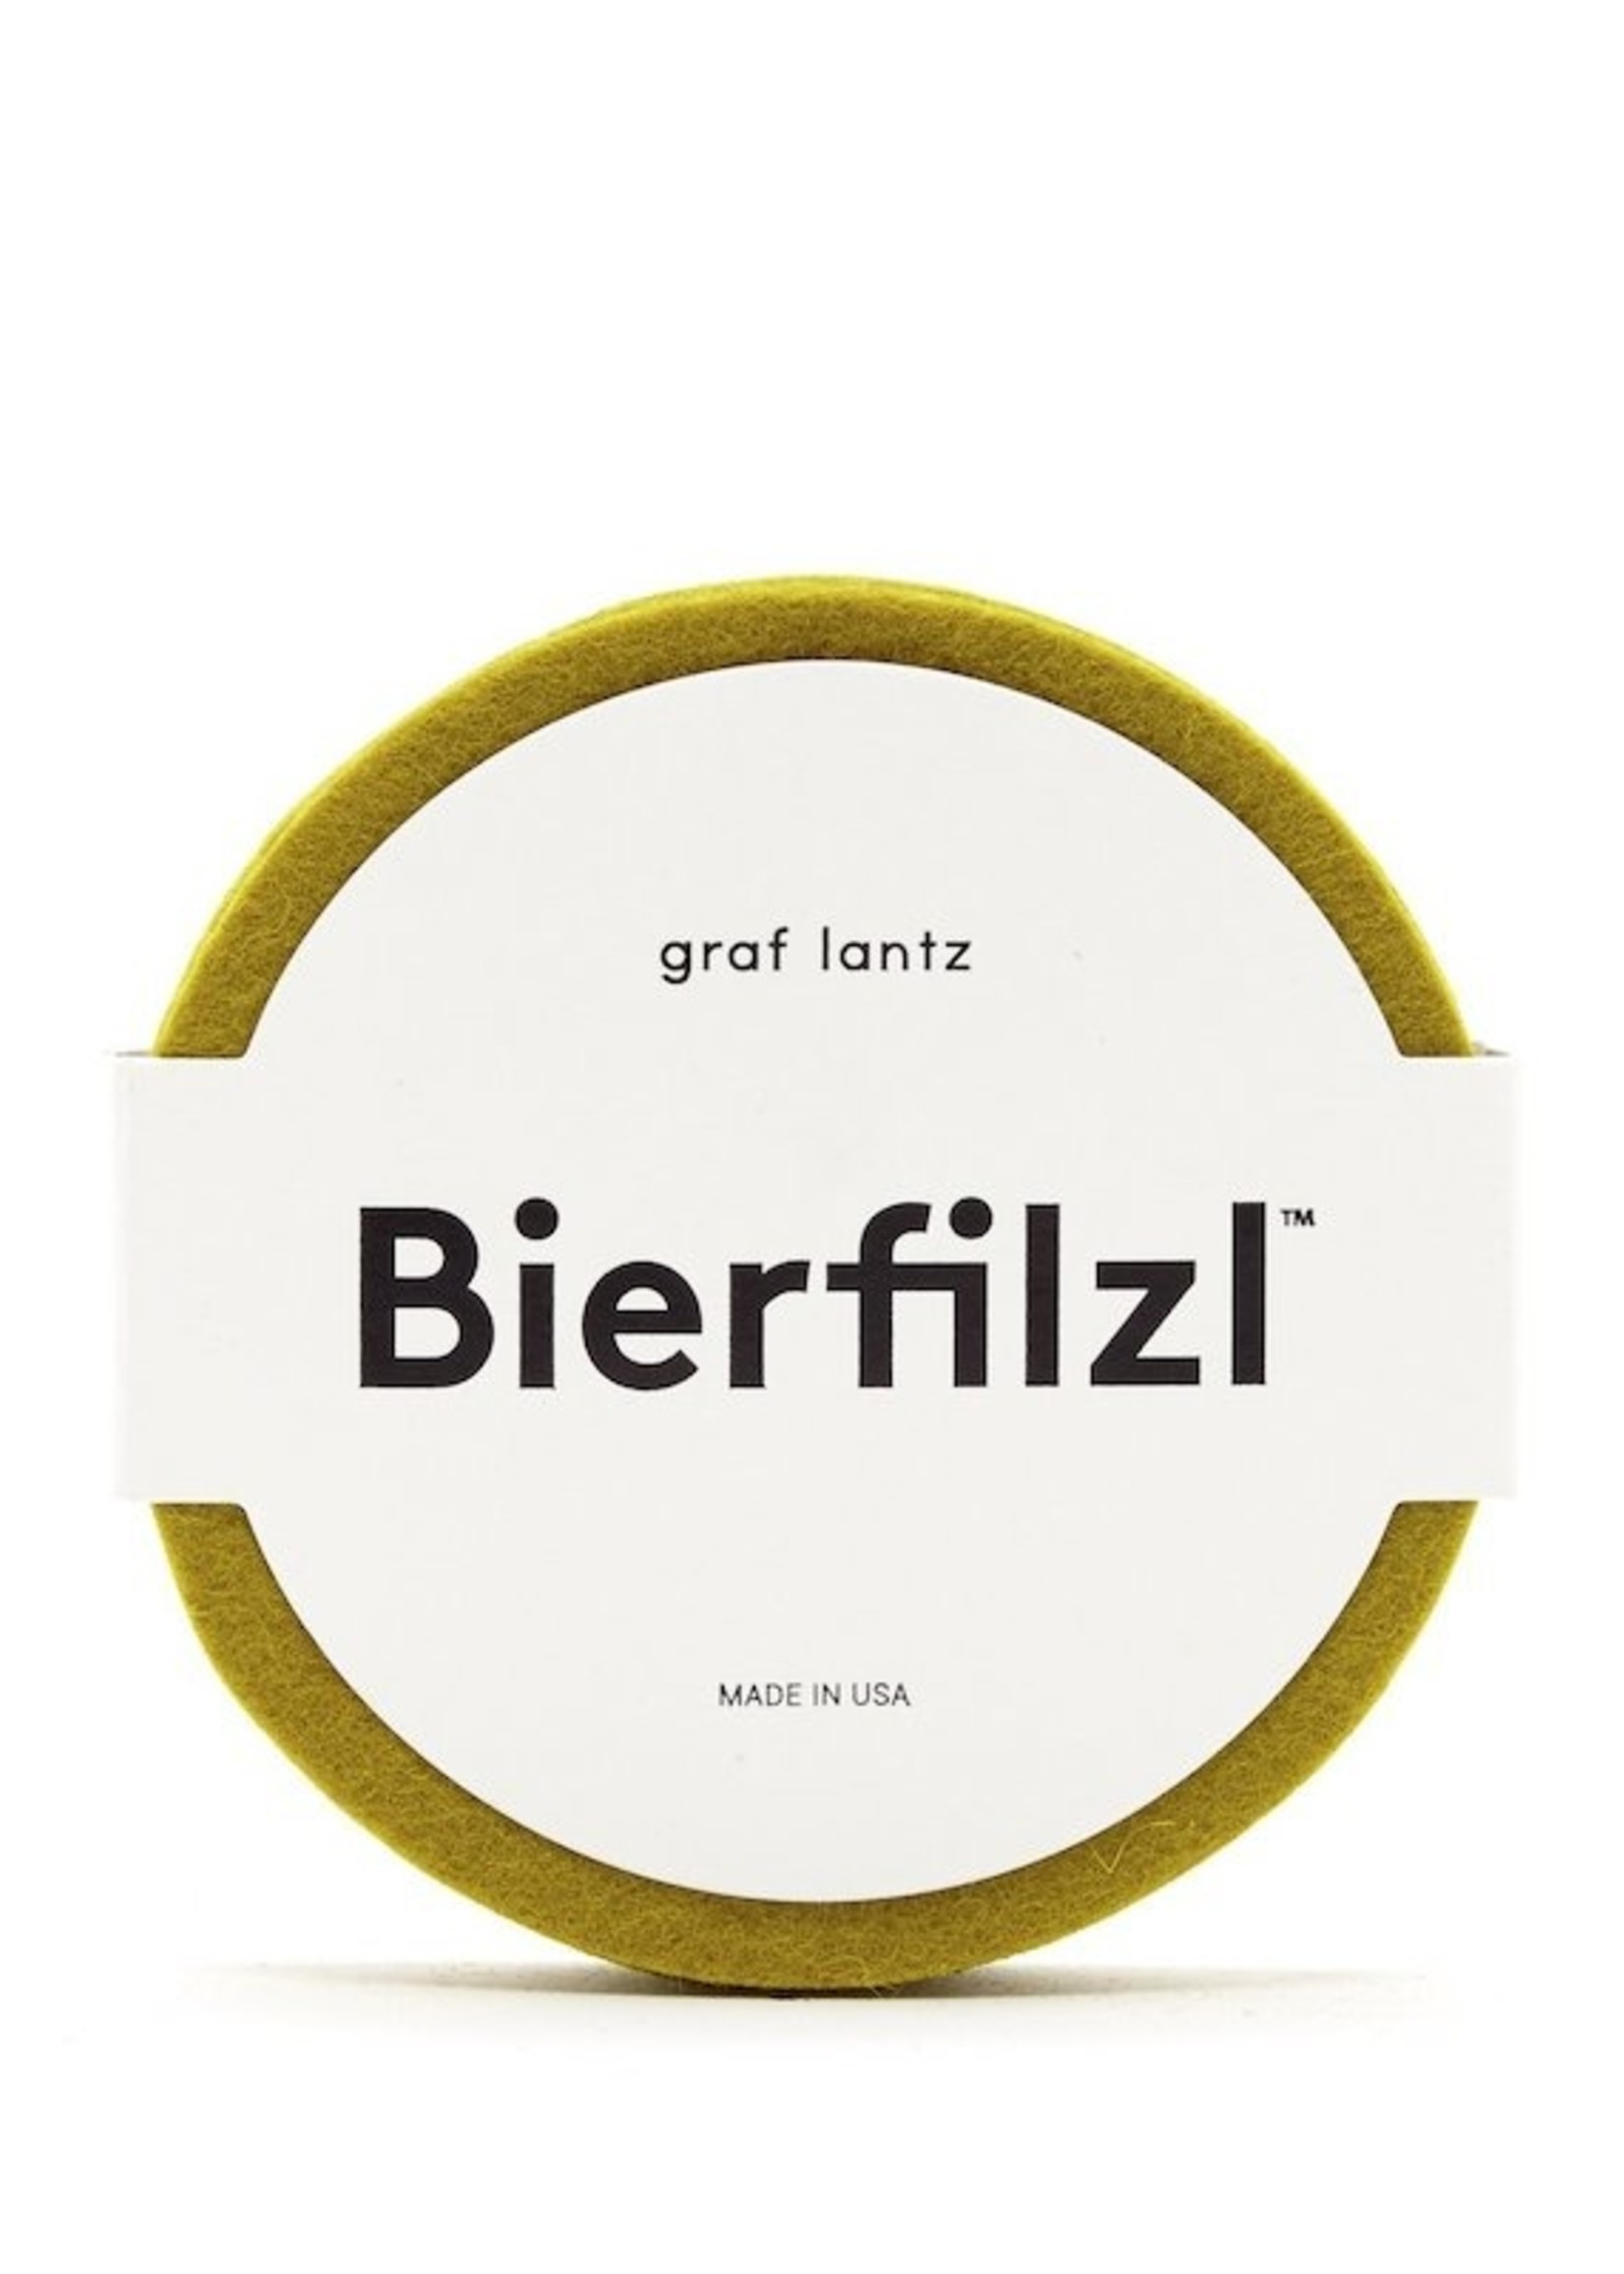 Graf&Lantz Bierfilzl Round Felt Coaster 4 Pack - Electric